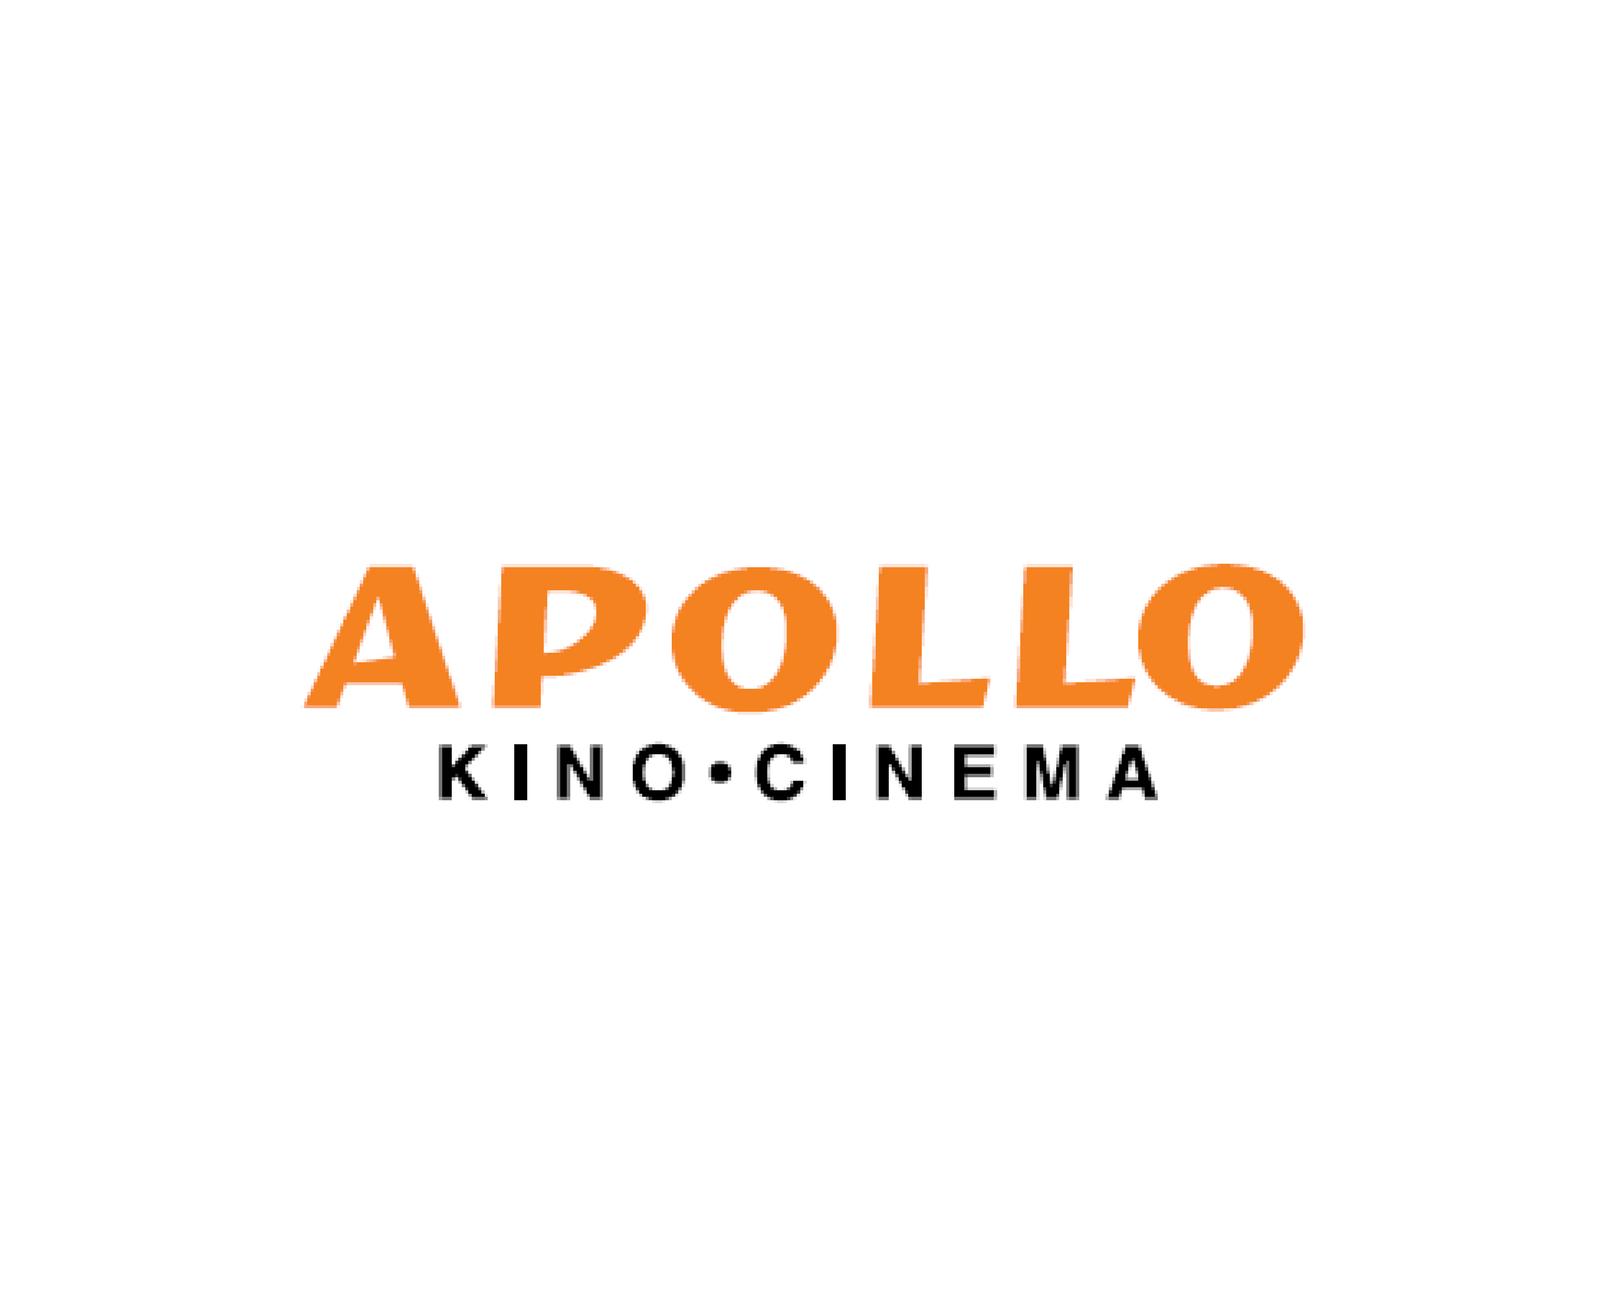 Apollo kino